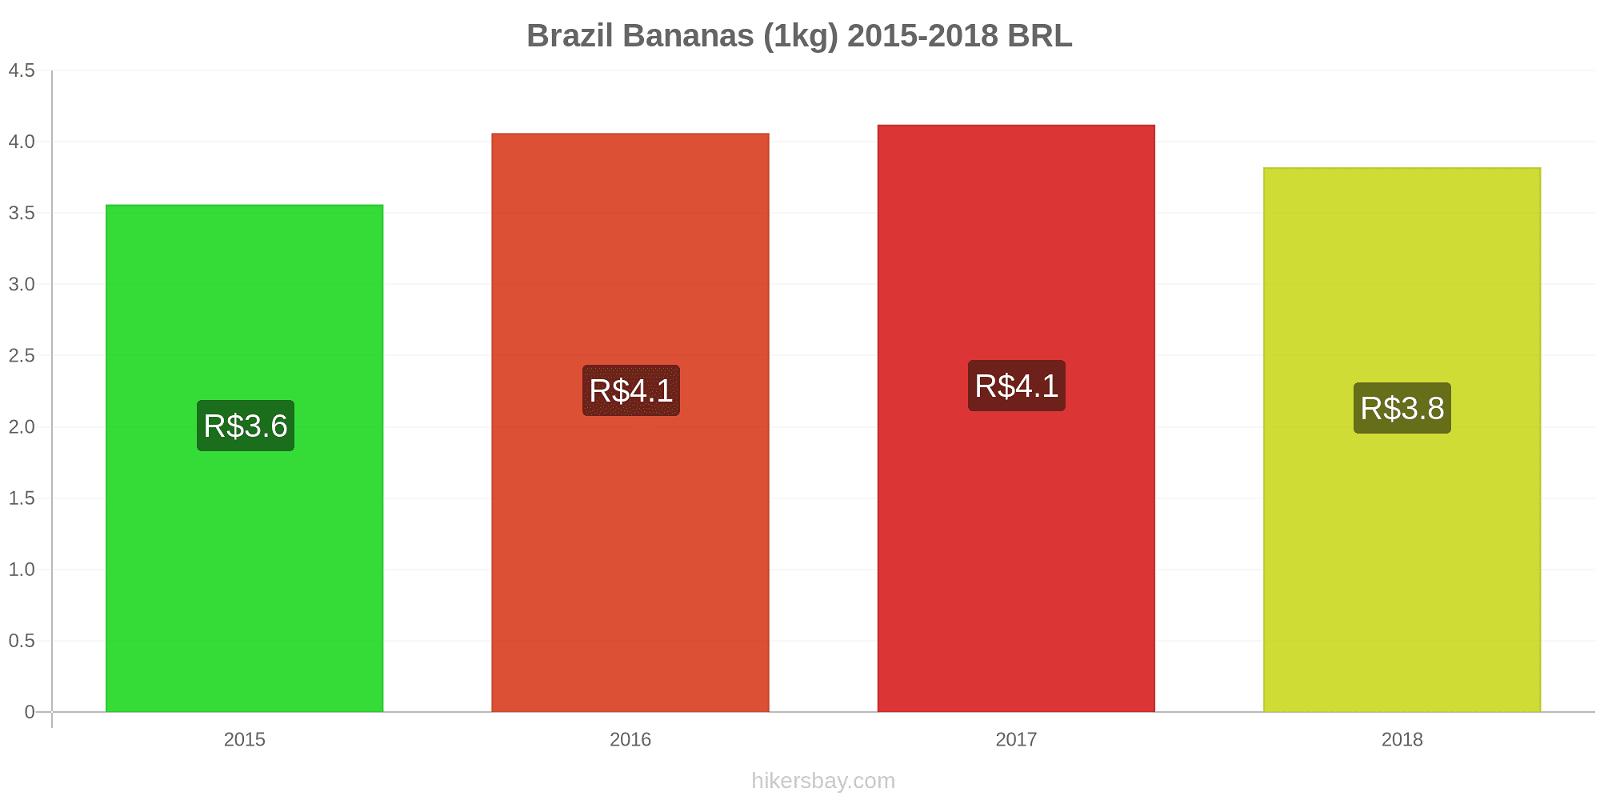 Brazil price changes Bananas (1kg) hikersbay.com